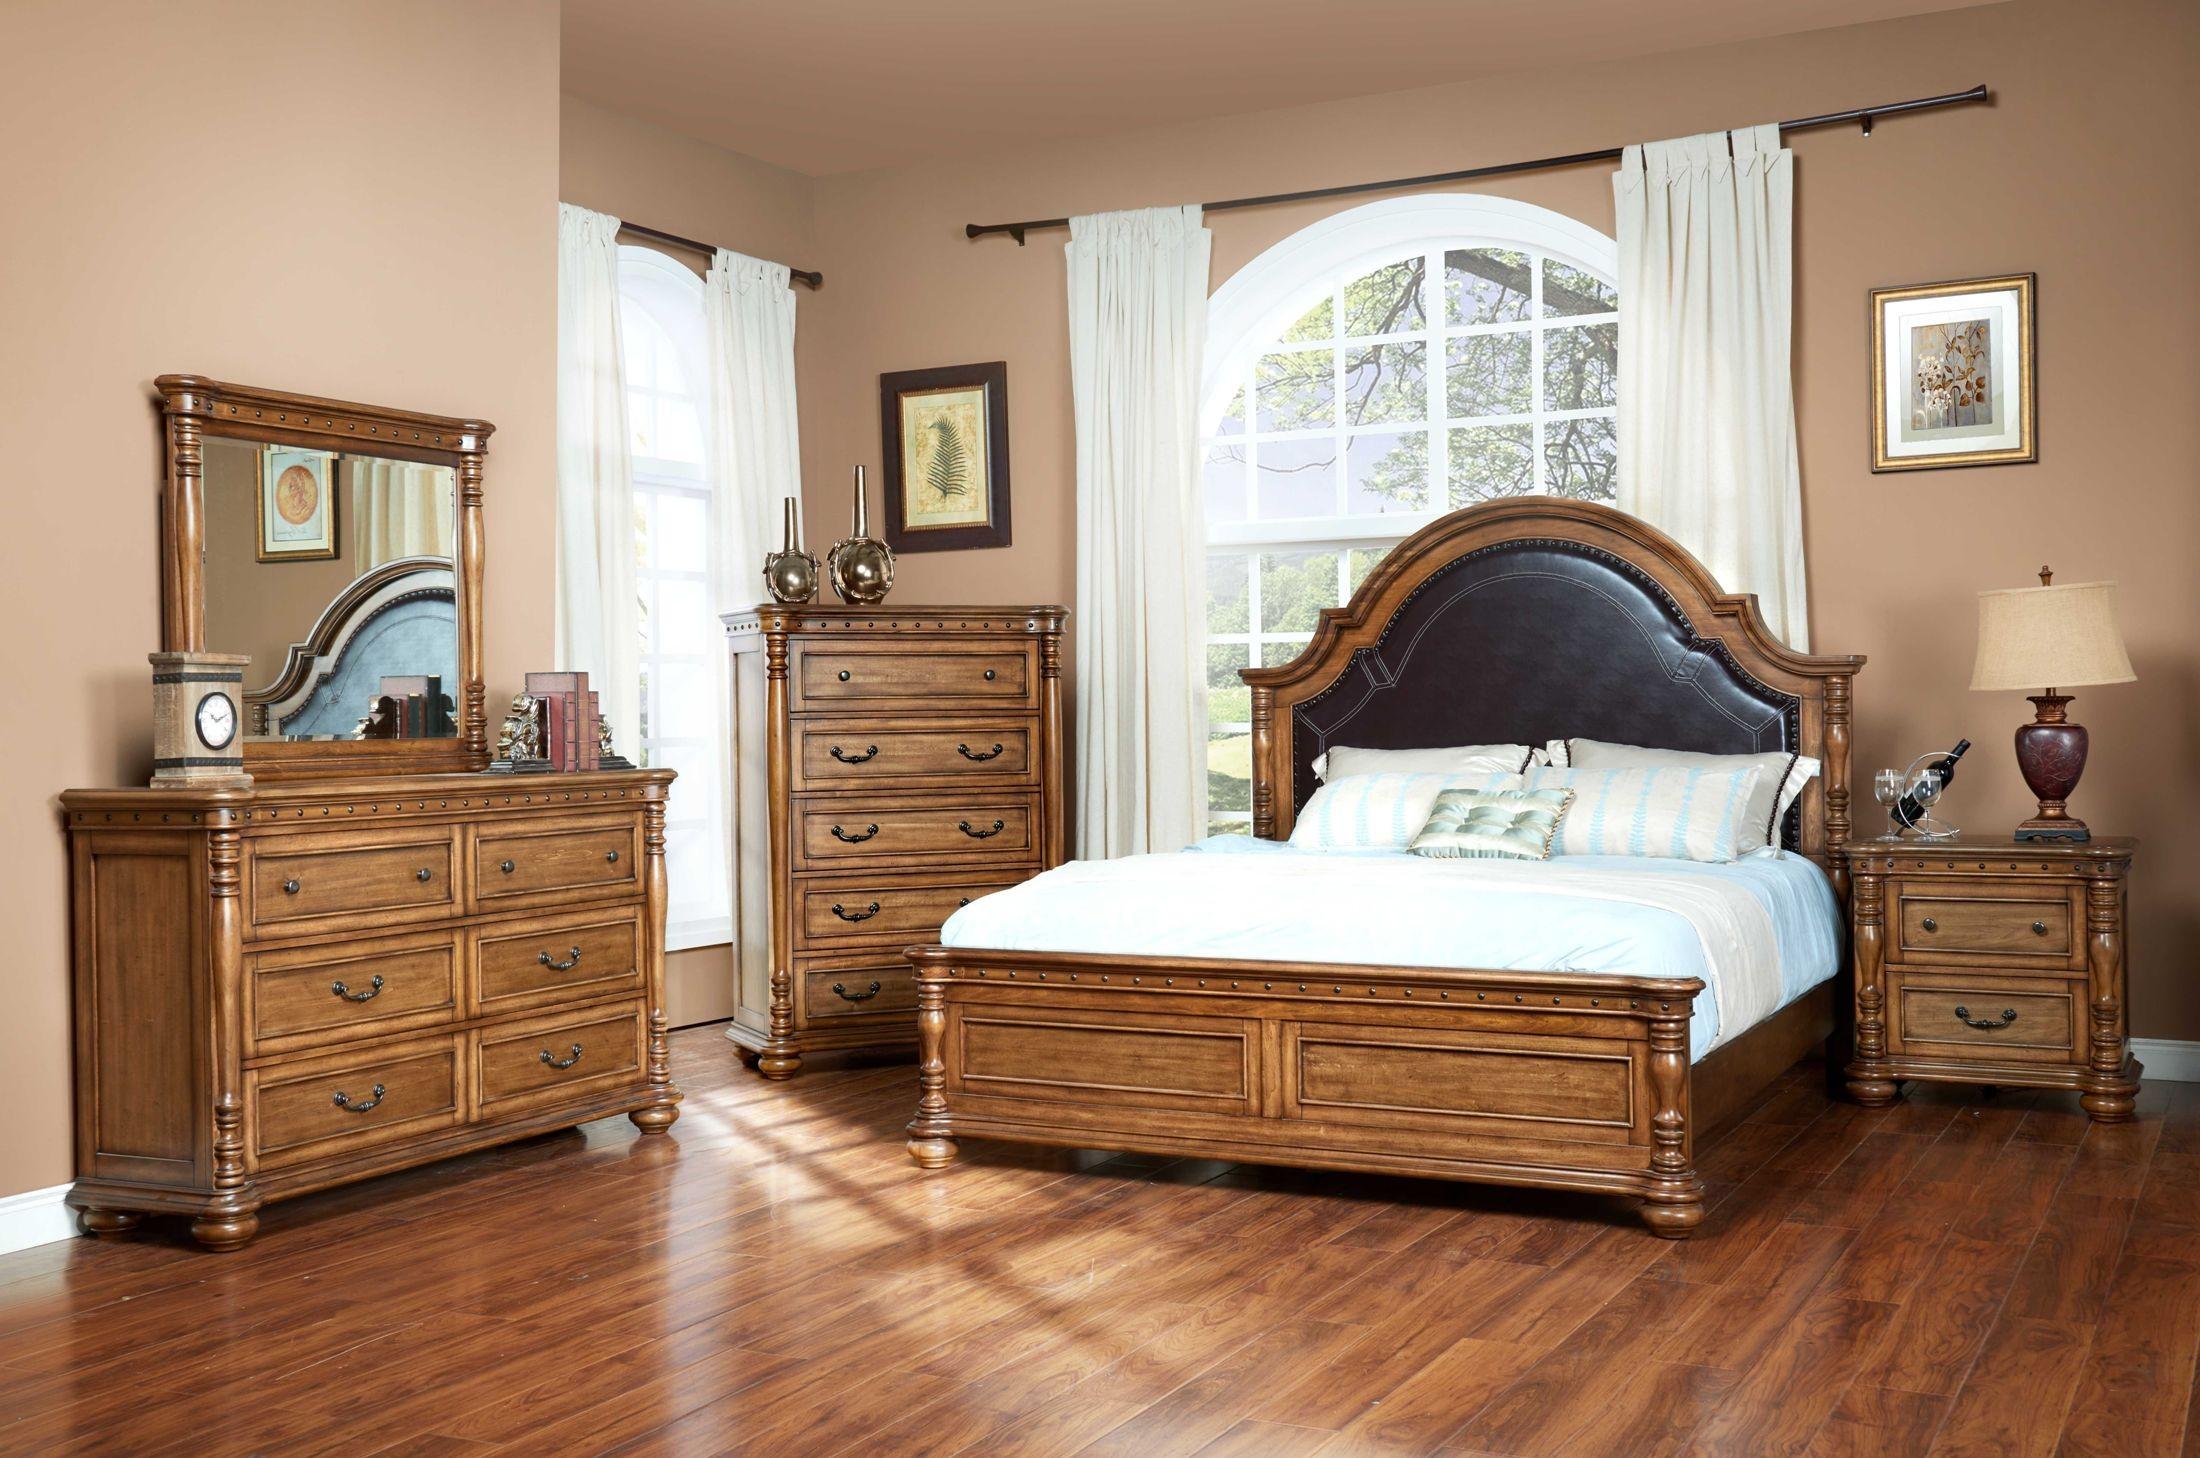 Bastion Umber Upholstered Panel Bedroom Set From New